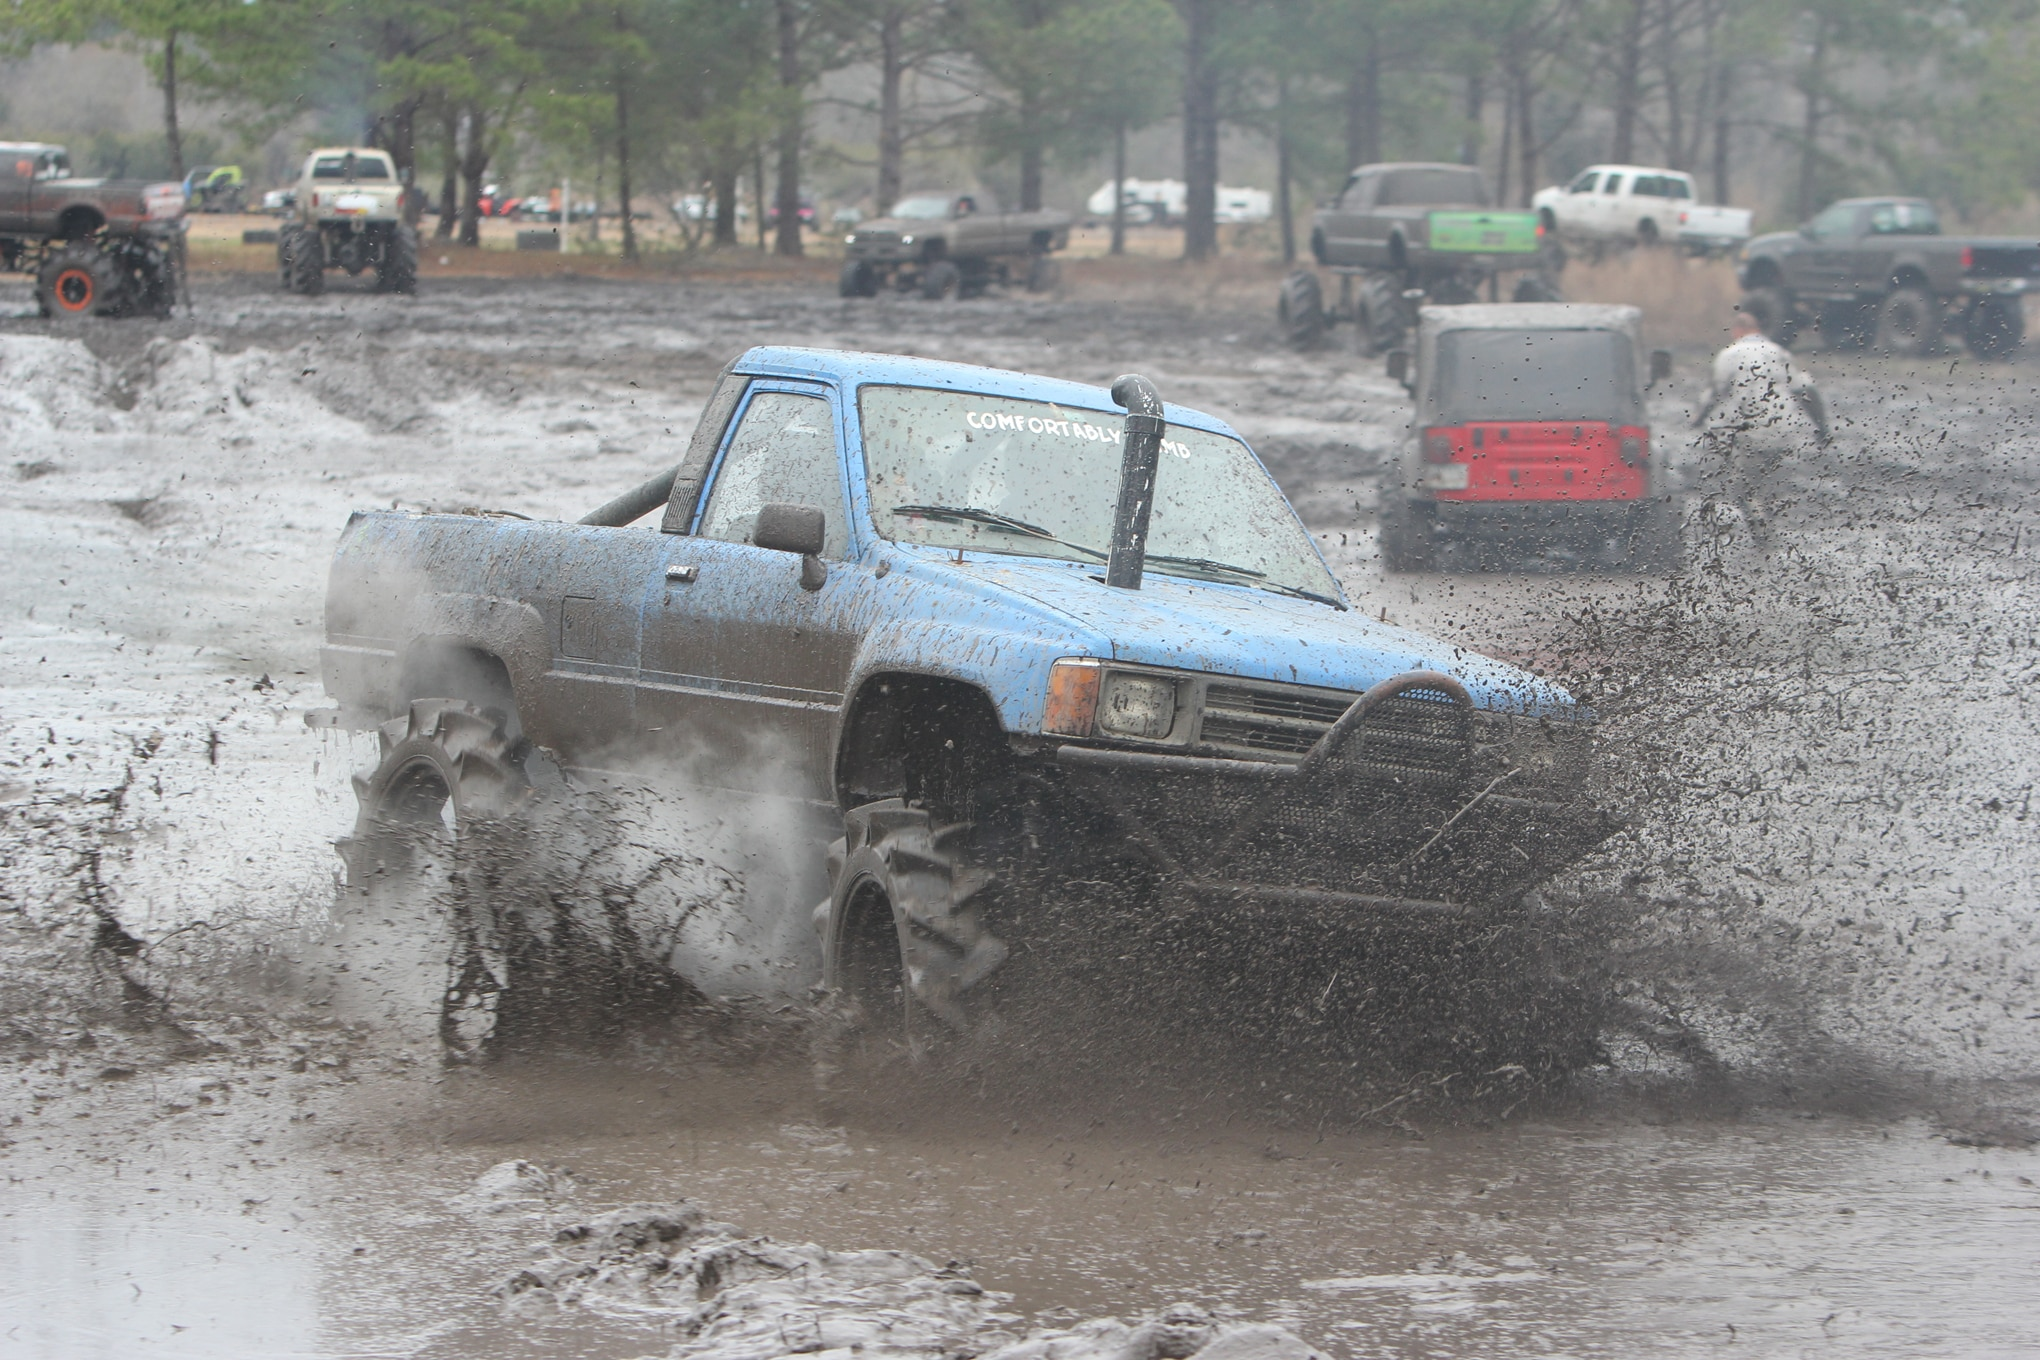 016 south berlin mud ranch 2016